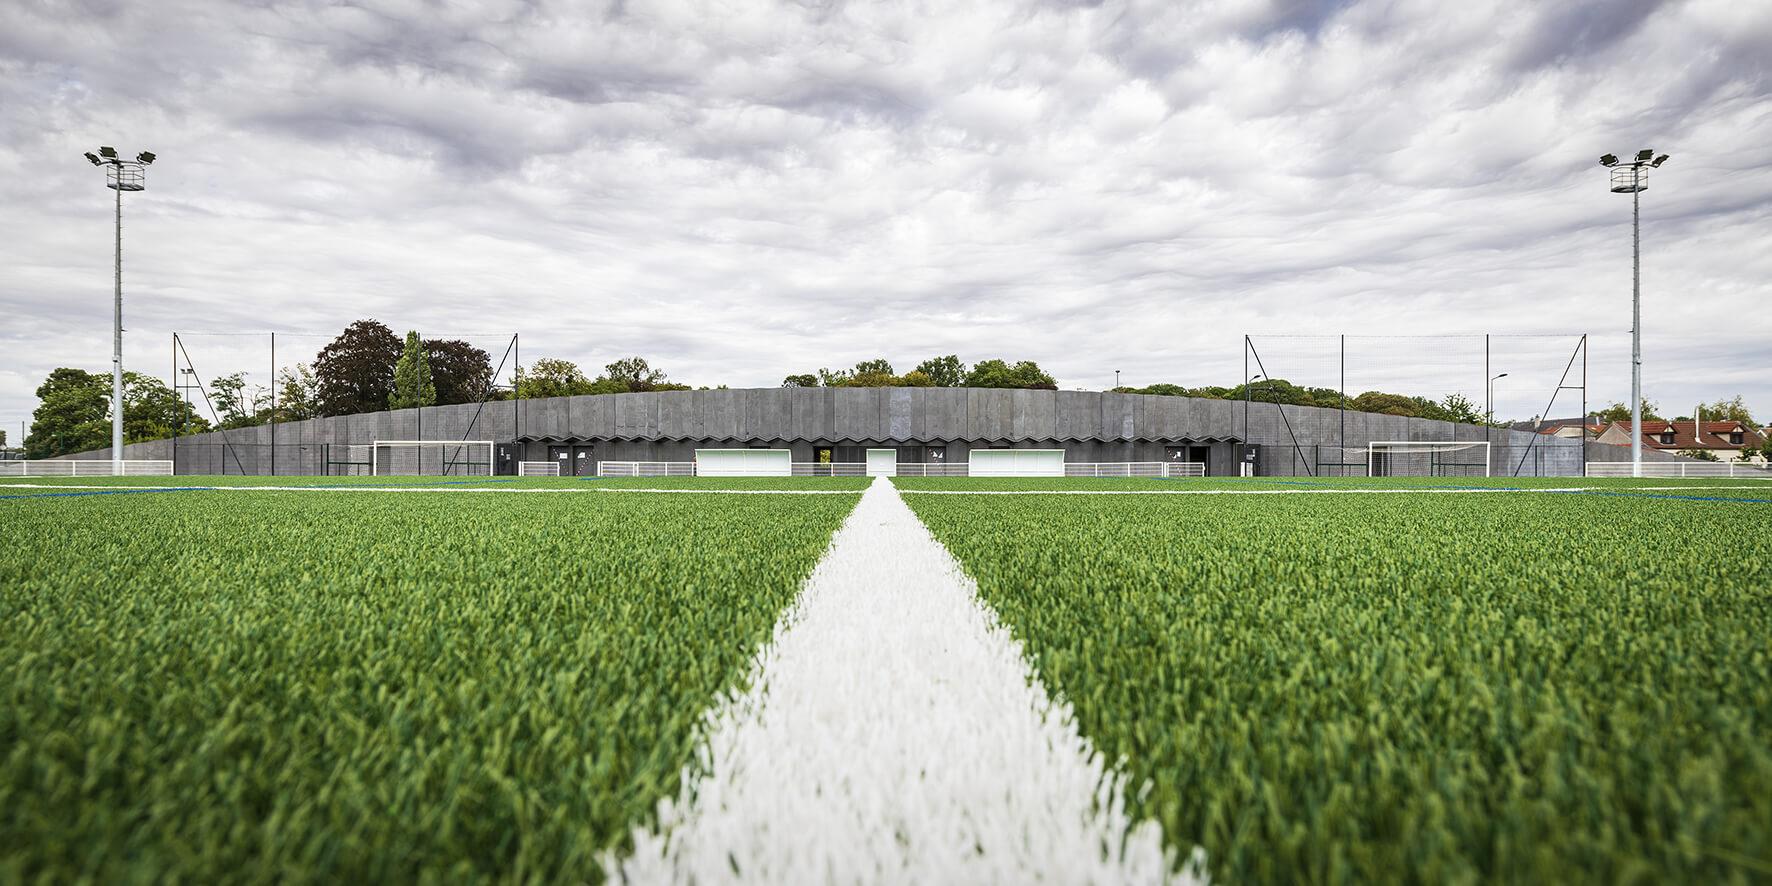 Stade Serge Lécrinier – Cormontreuil (51) – 2019